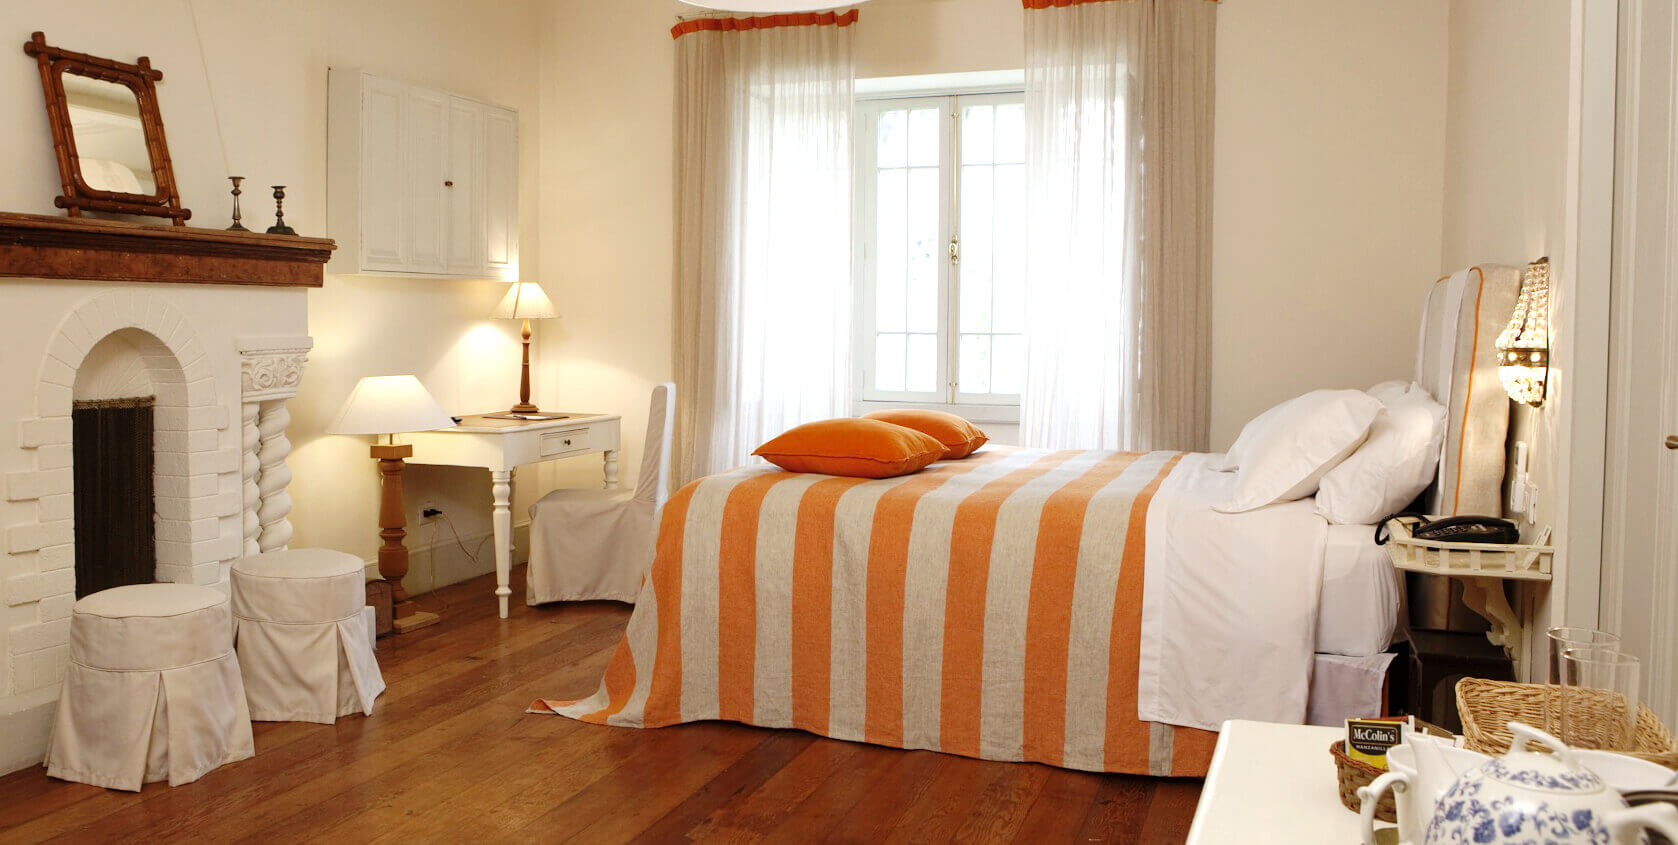 Room at the Quinta Hotel in Miraflores